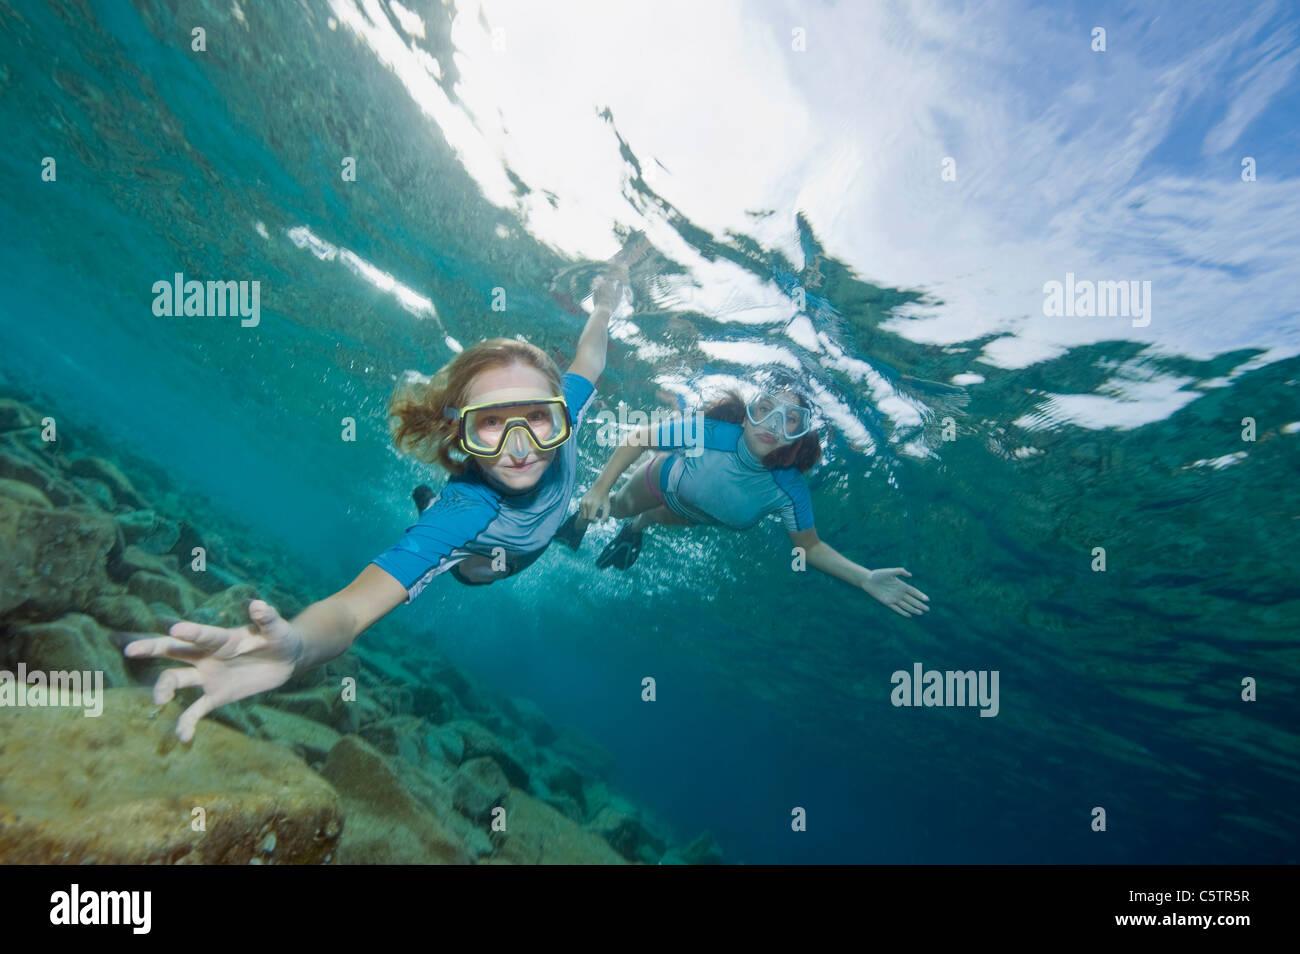 Croacia, dos niñas (6-7), (10-11), snorkeling, Retrato Imagen De Stock